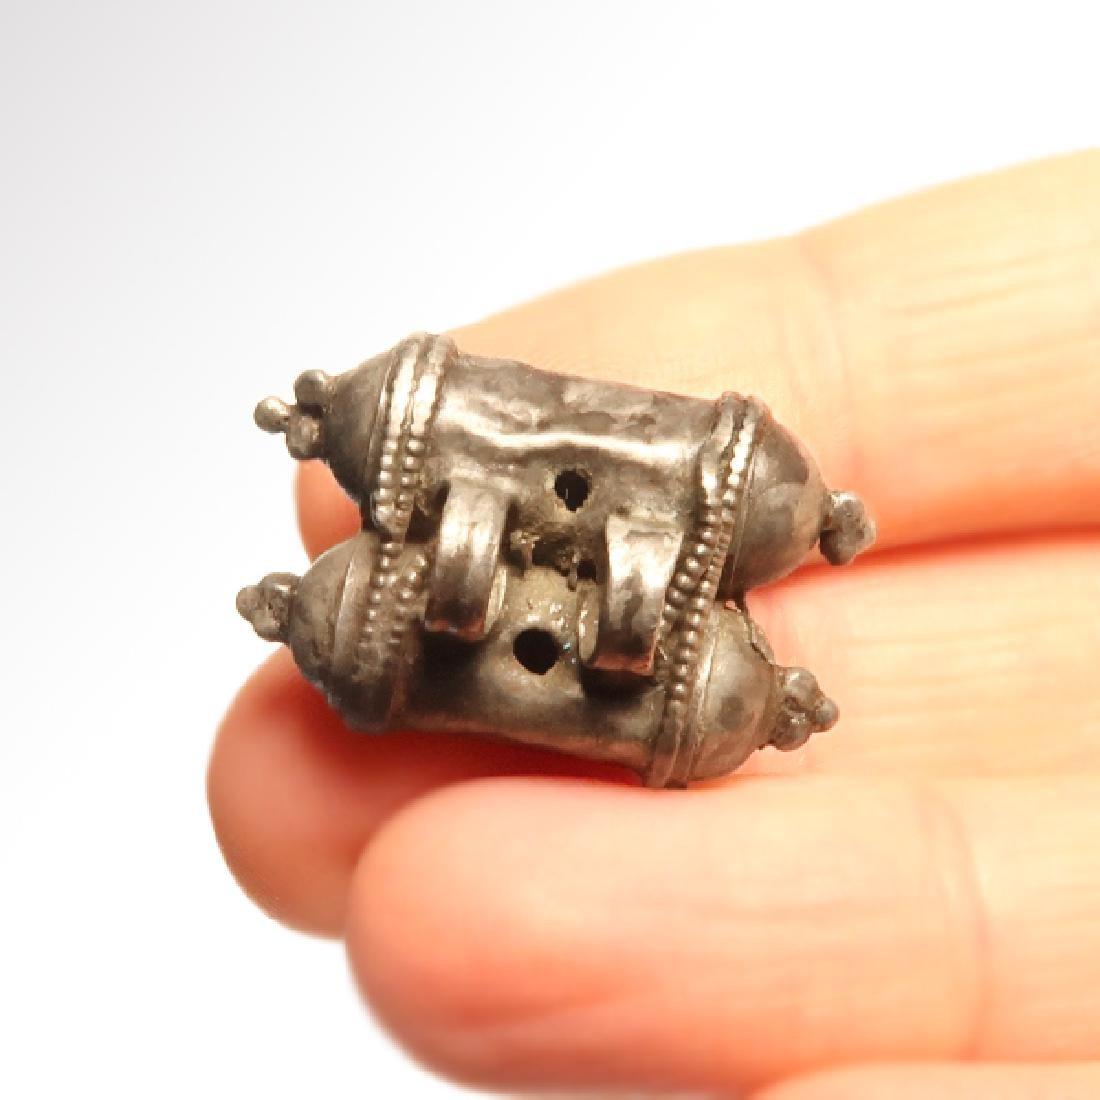 Roman Silver Pendant, Amulet/Talisman Holder, c. 2nd - 2